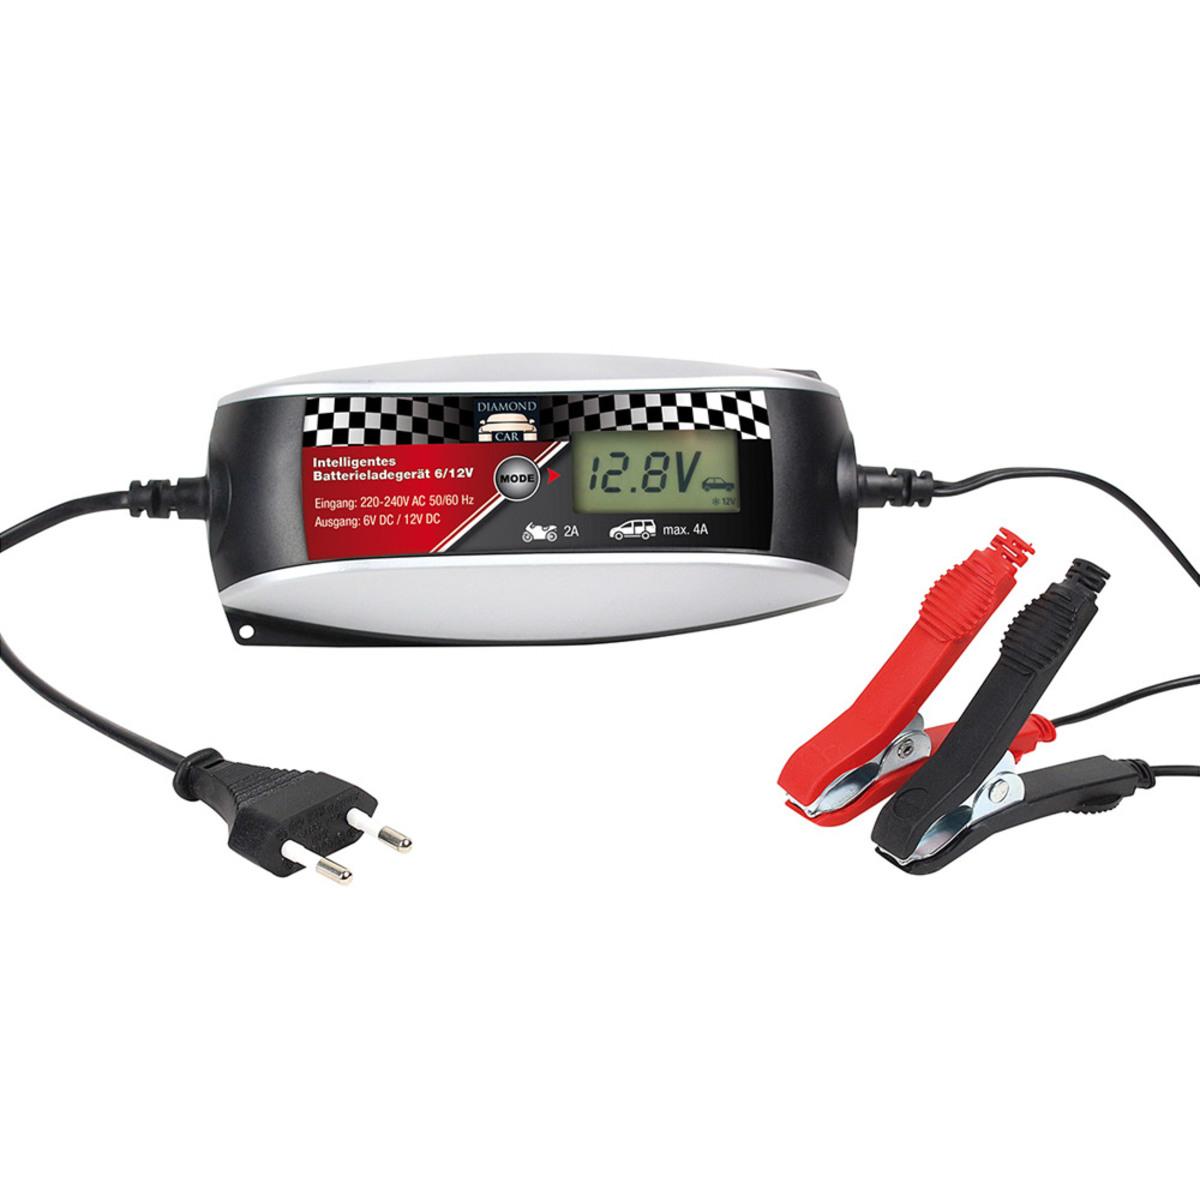 Bild 1 von Diamond Car Intelligentes Batterie-Ladegerät 6/12V, 4 A